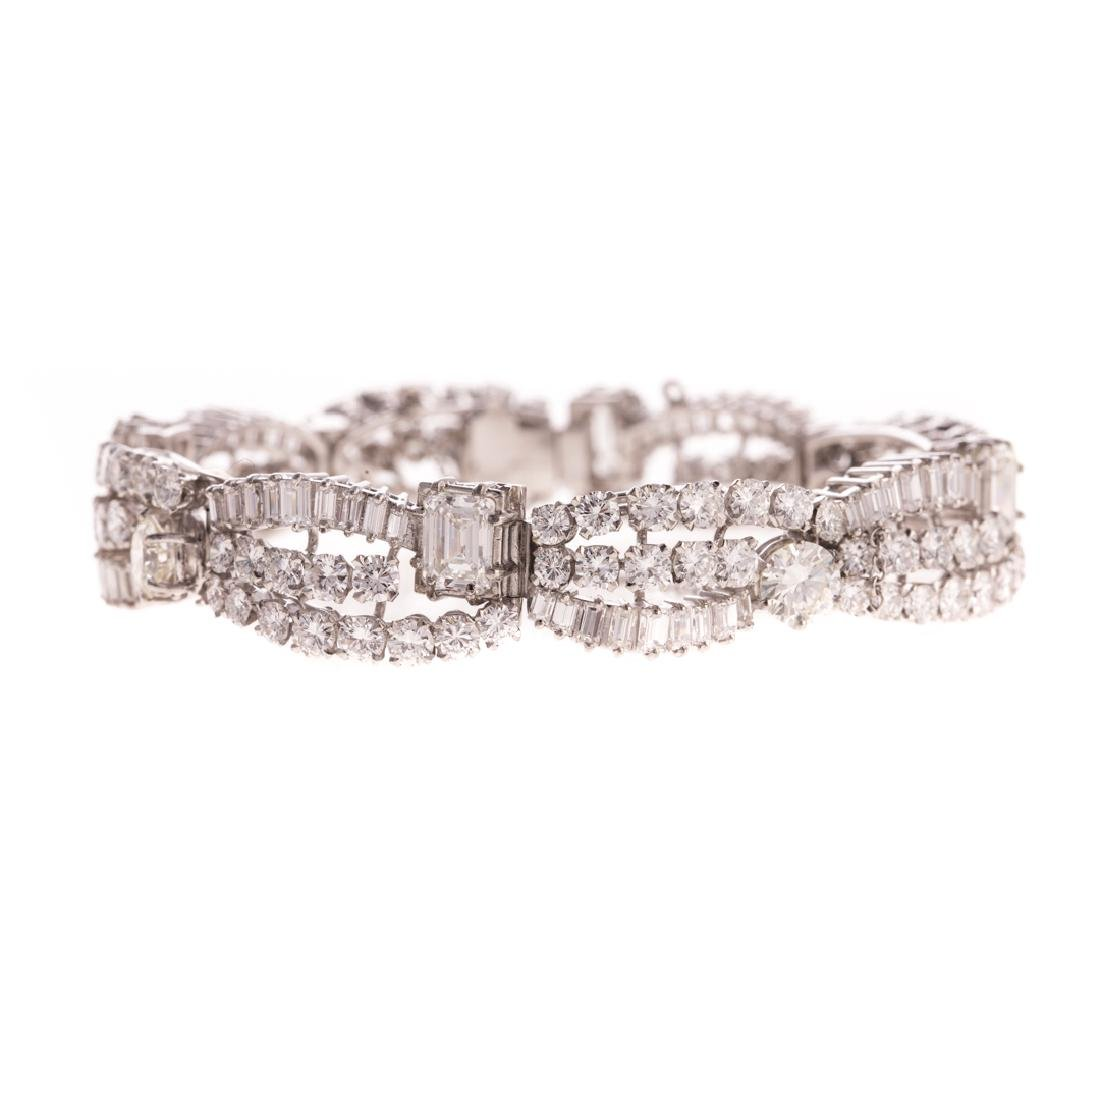 An Important Lady's Diamond & Platinum Bracelet